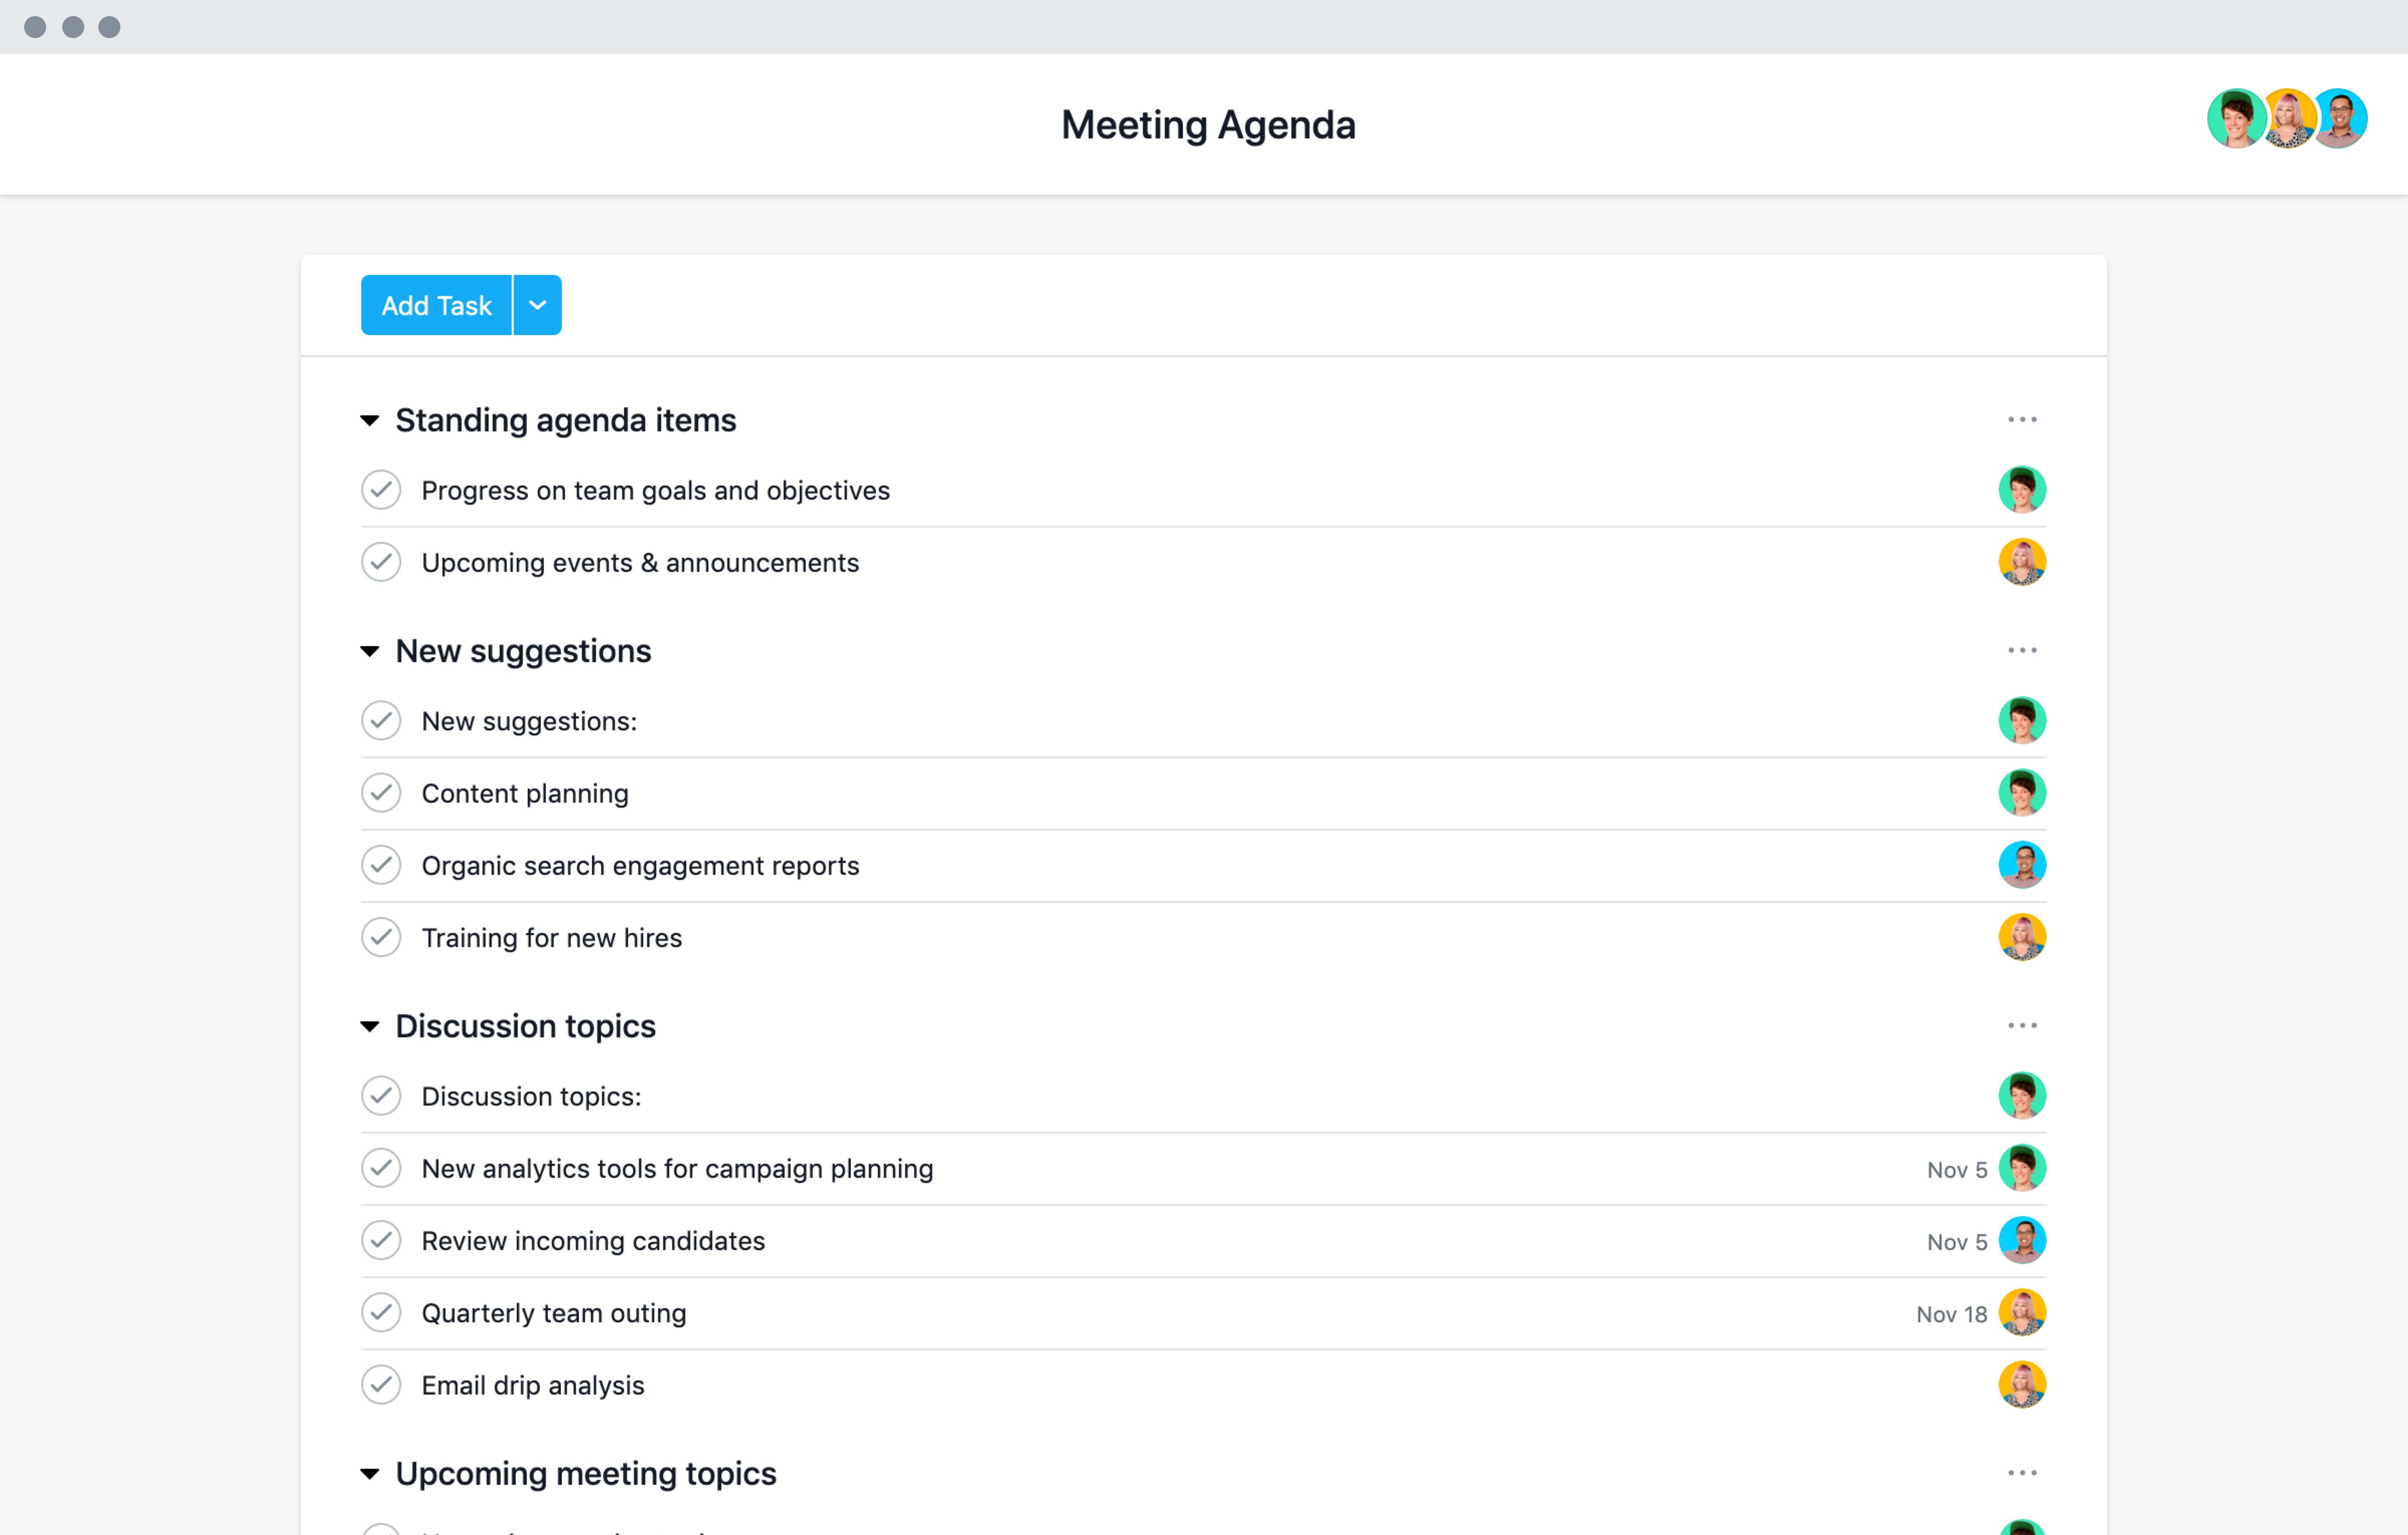 Easy To Adapt Meeting Agenda Template · Asana With Regard To Training Agenda Template